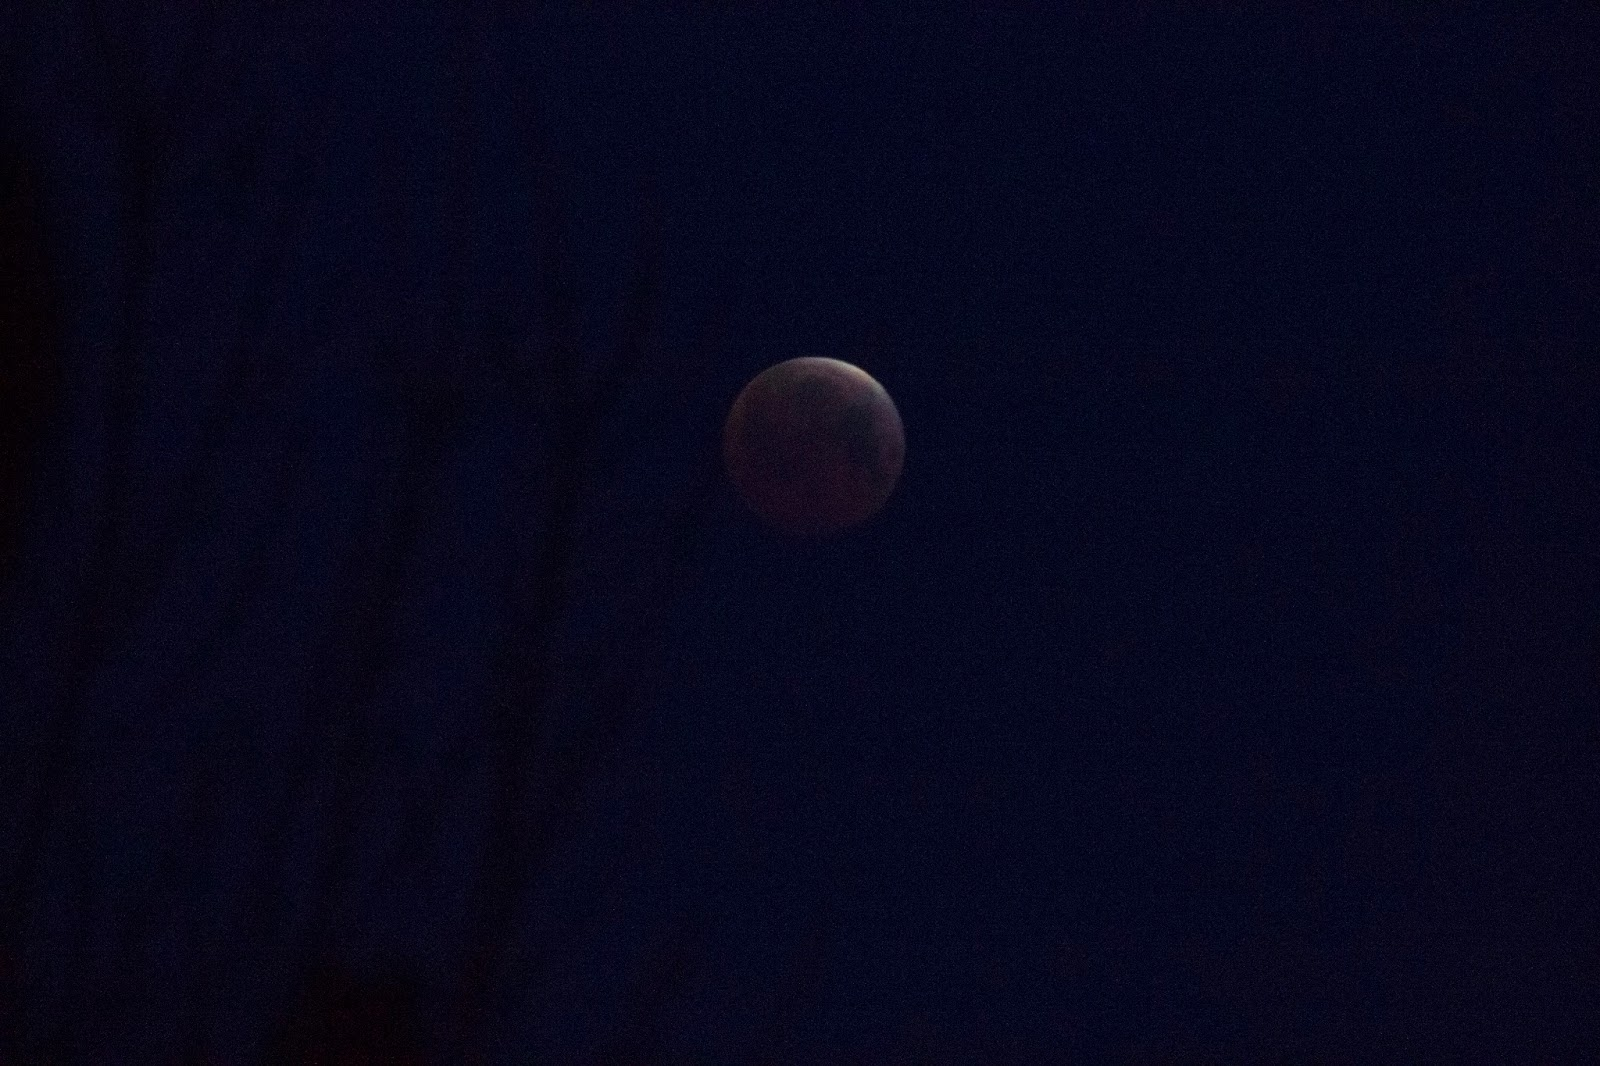 blood moon july 2018 houston - photo #42